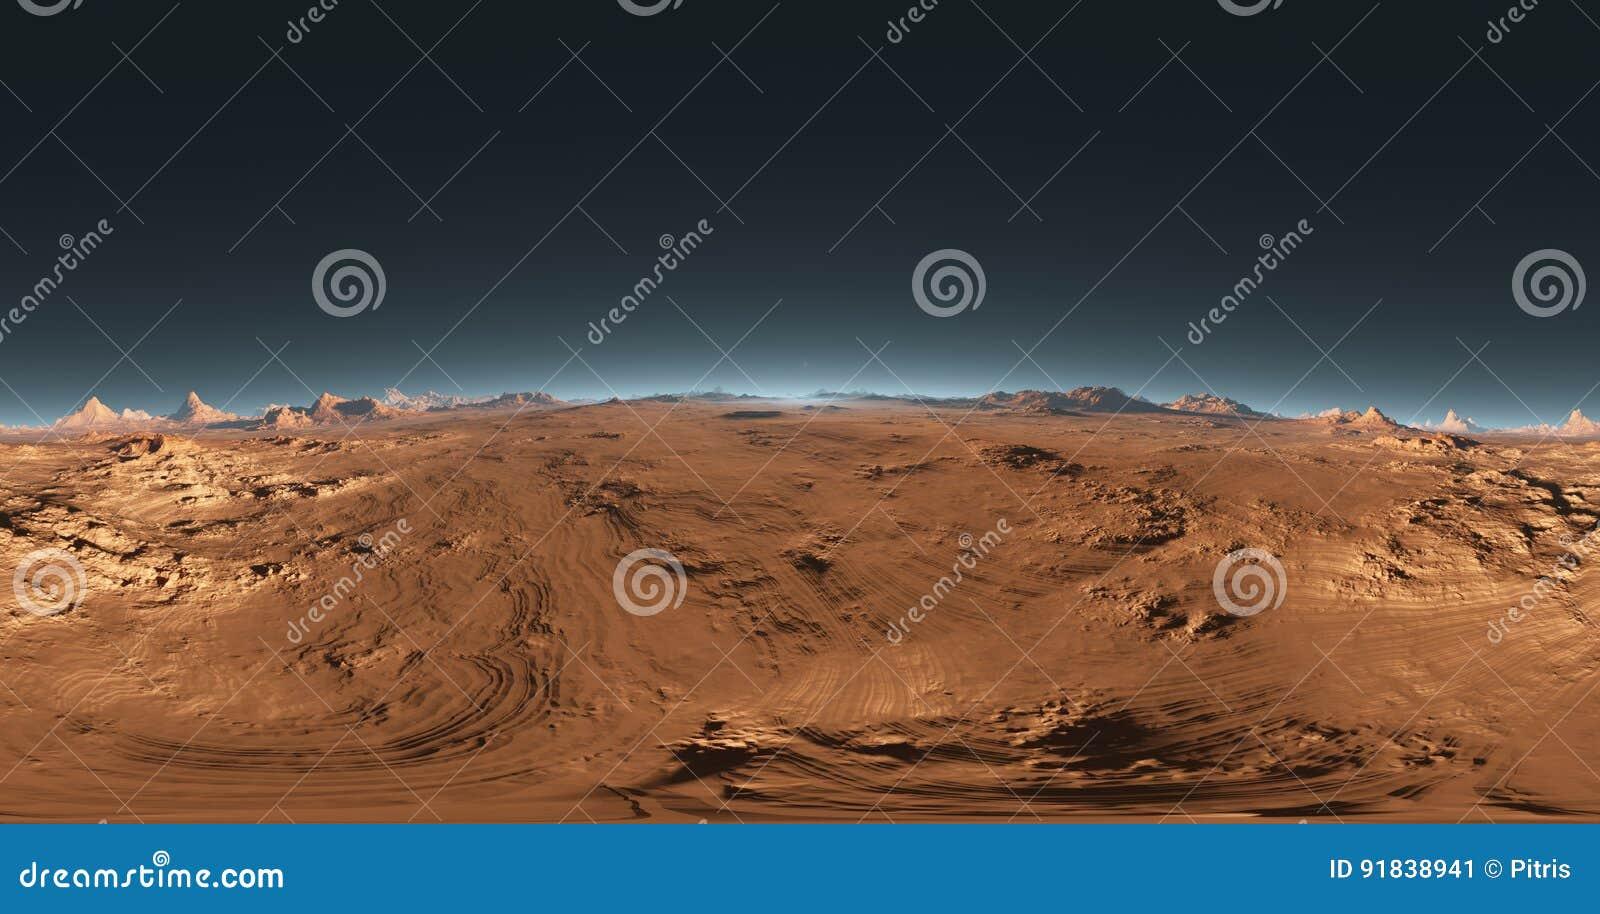 Panorama von Mars-Sonnenuntergang, Karte der Umwelt HDRI Equirectangular-Projektion, kugelförmiges Panorama Marslandschaft